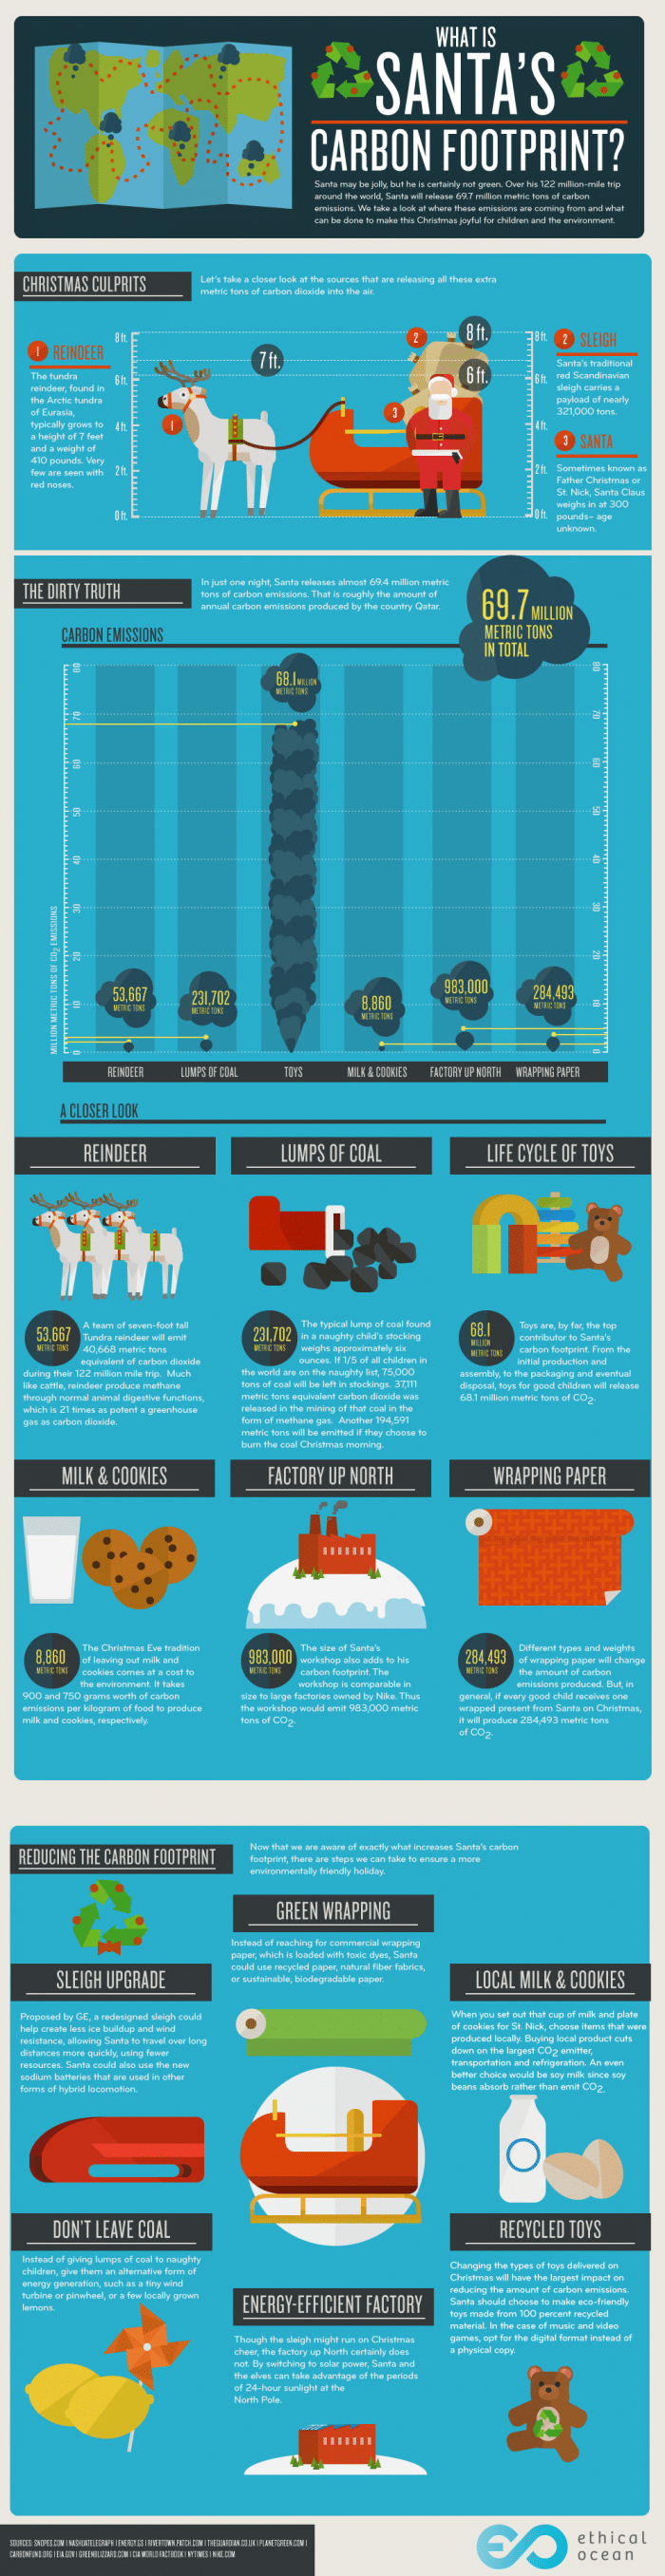 carbon-footprint-santa-infographic-700x2713